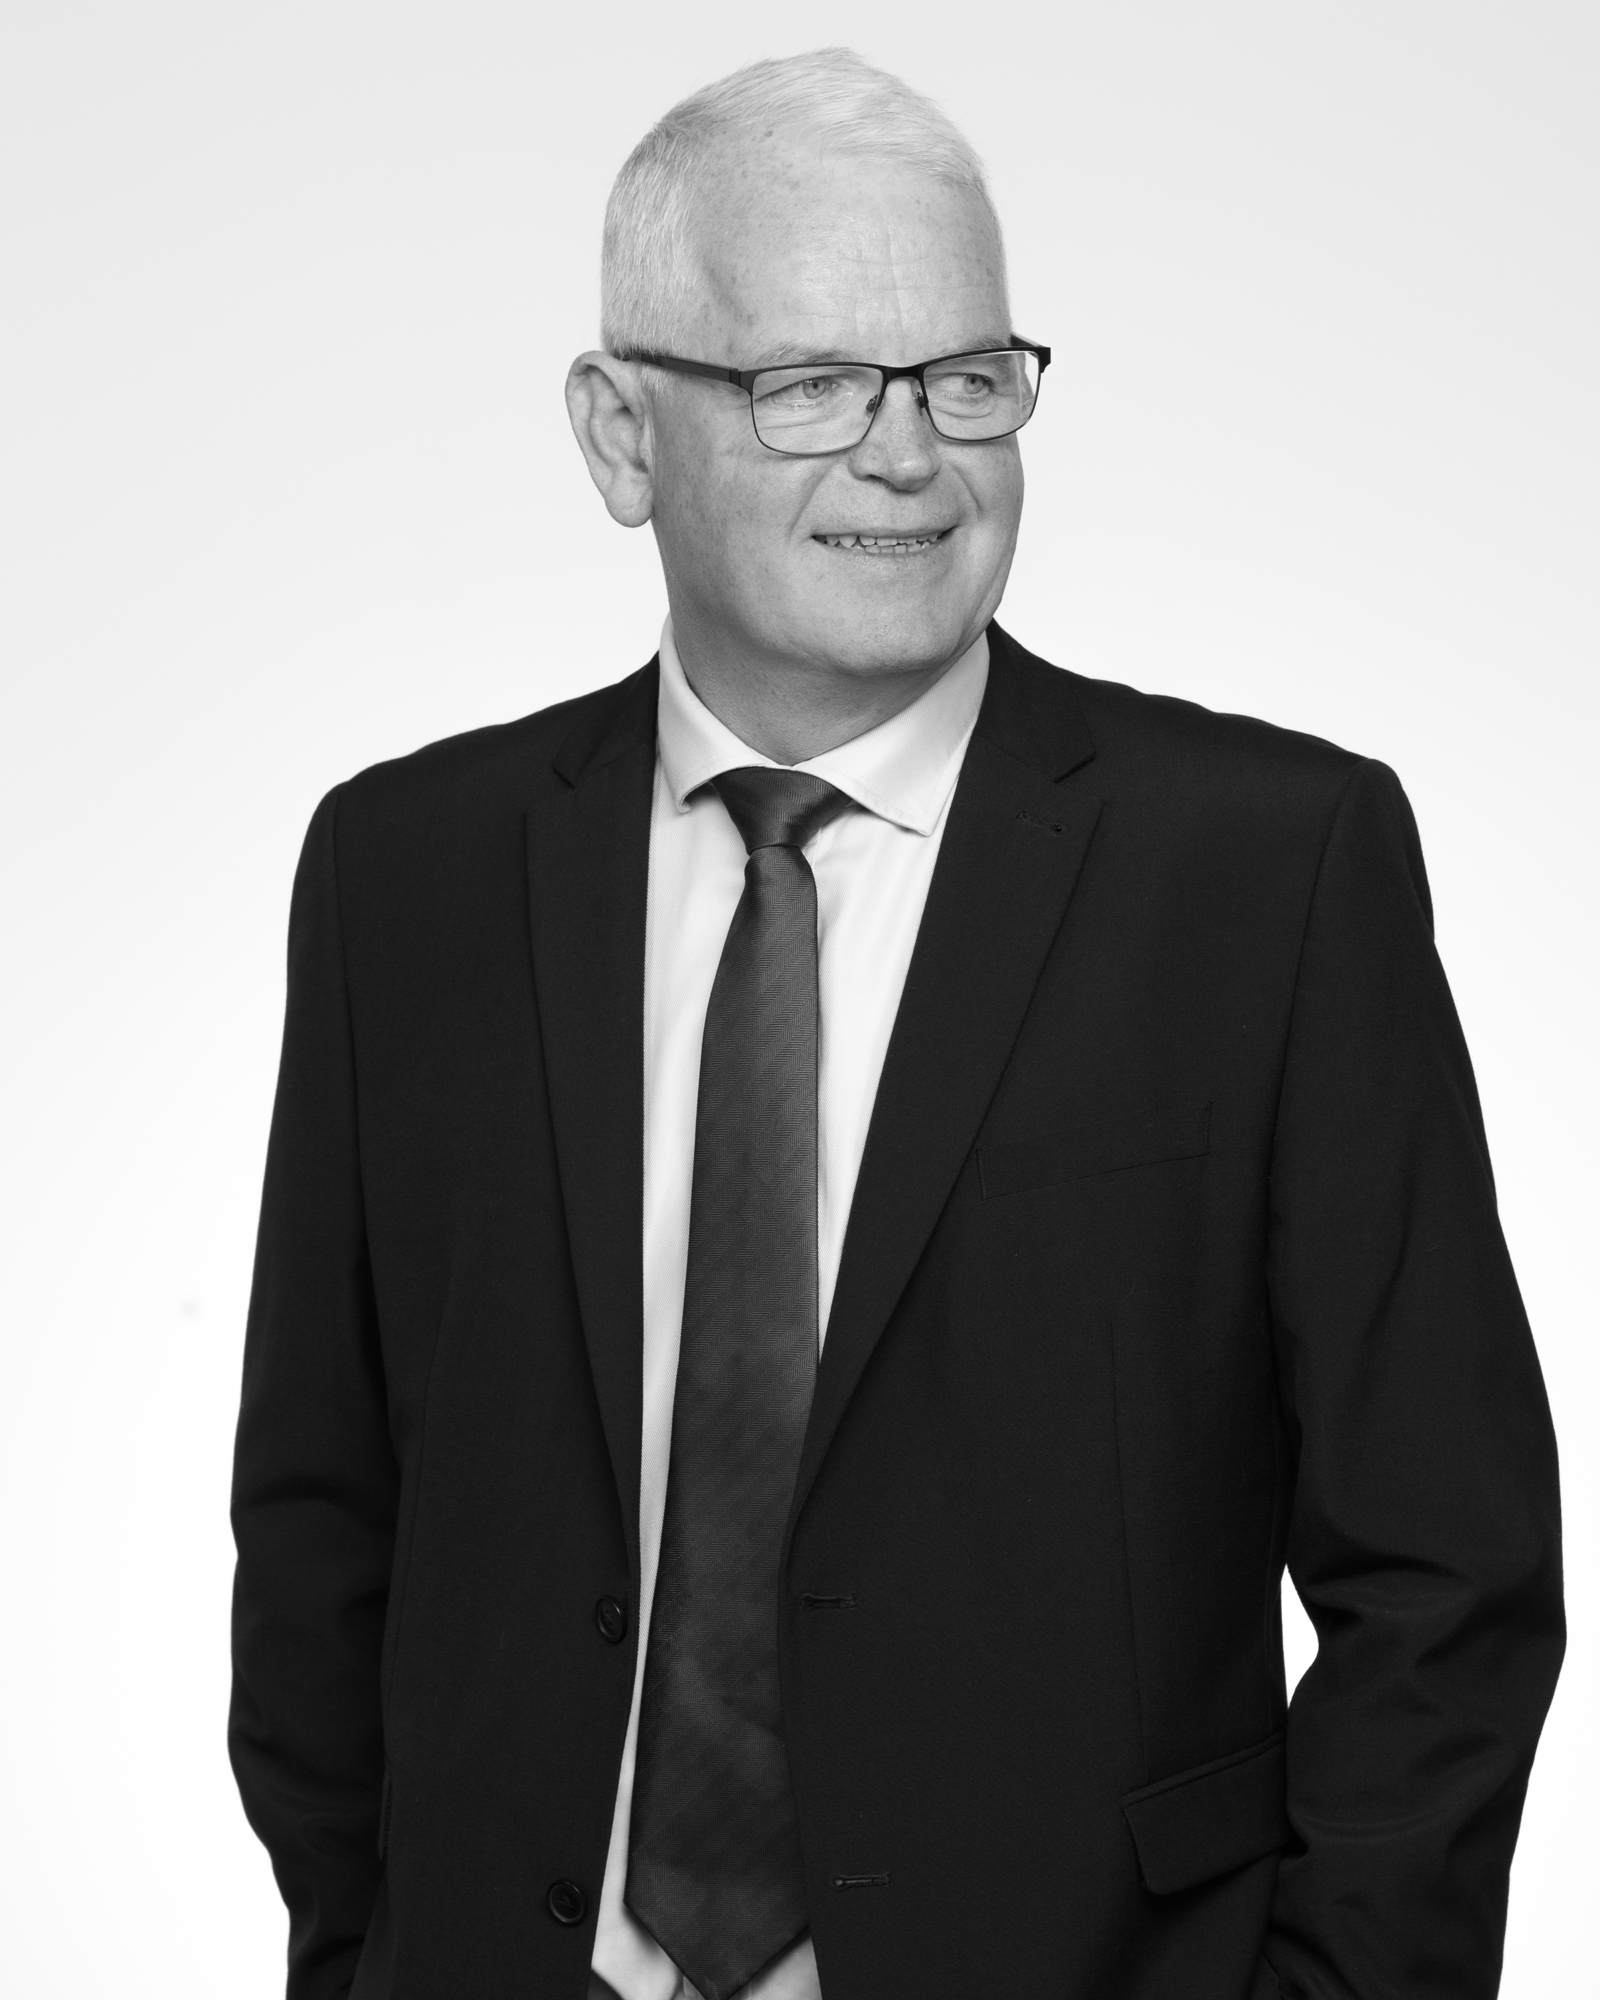 David Reekie